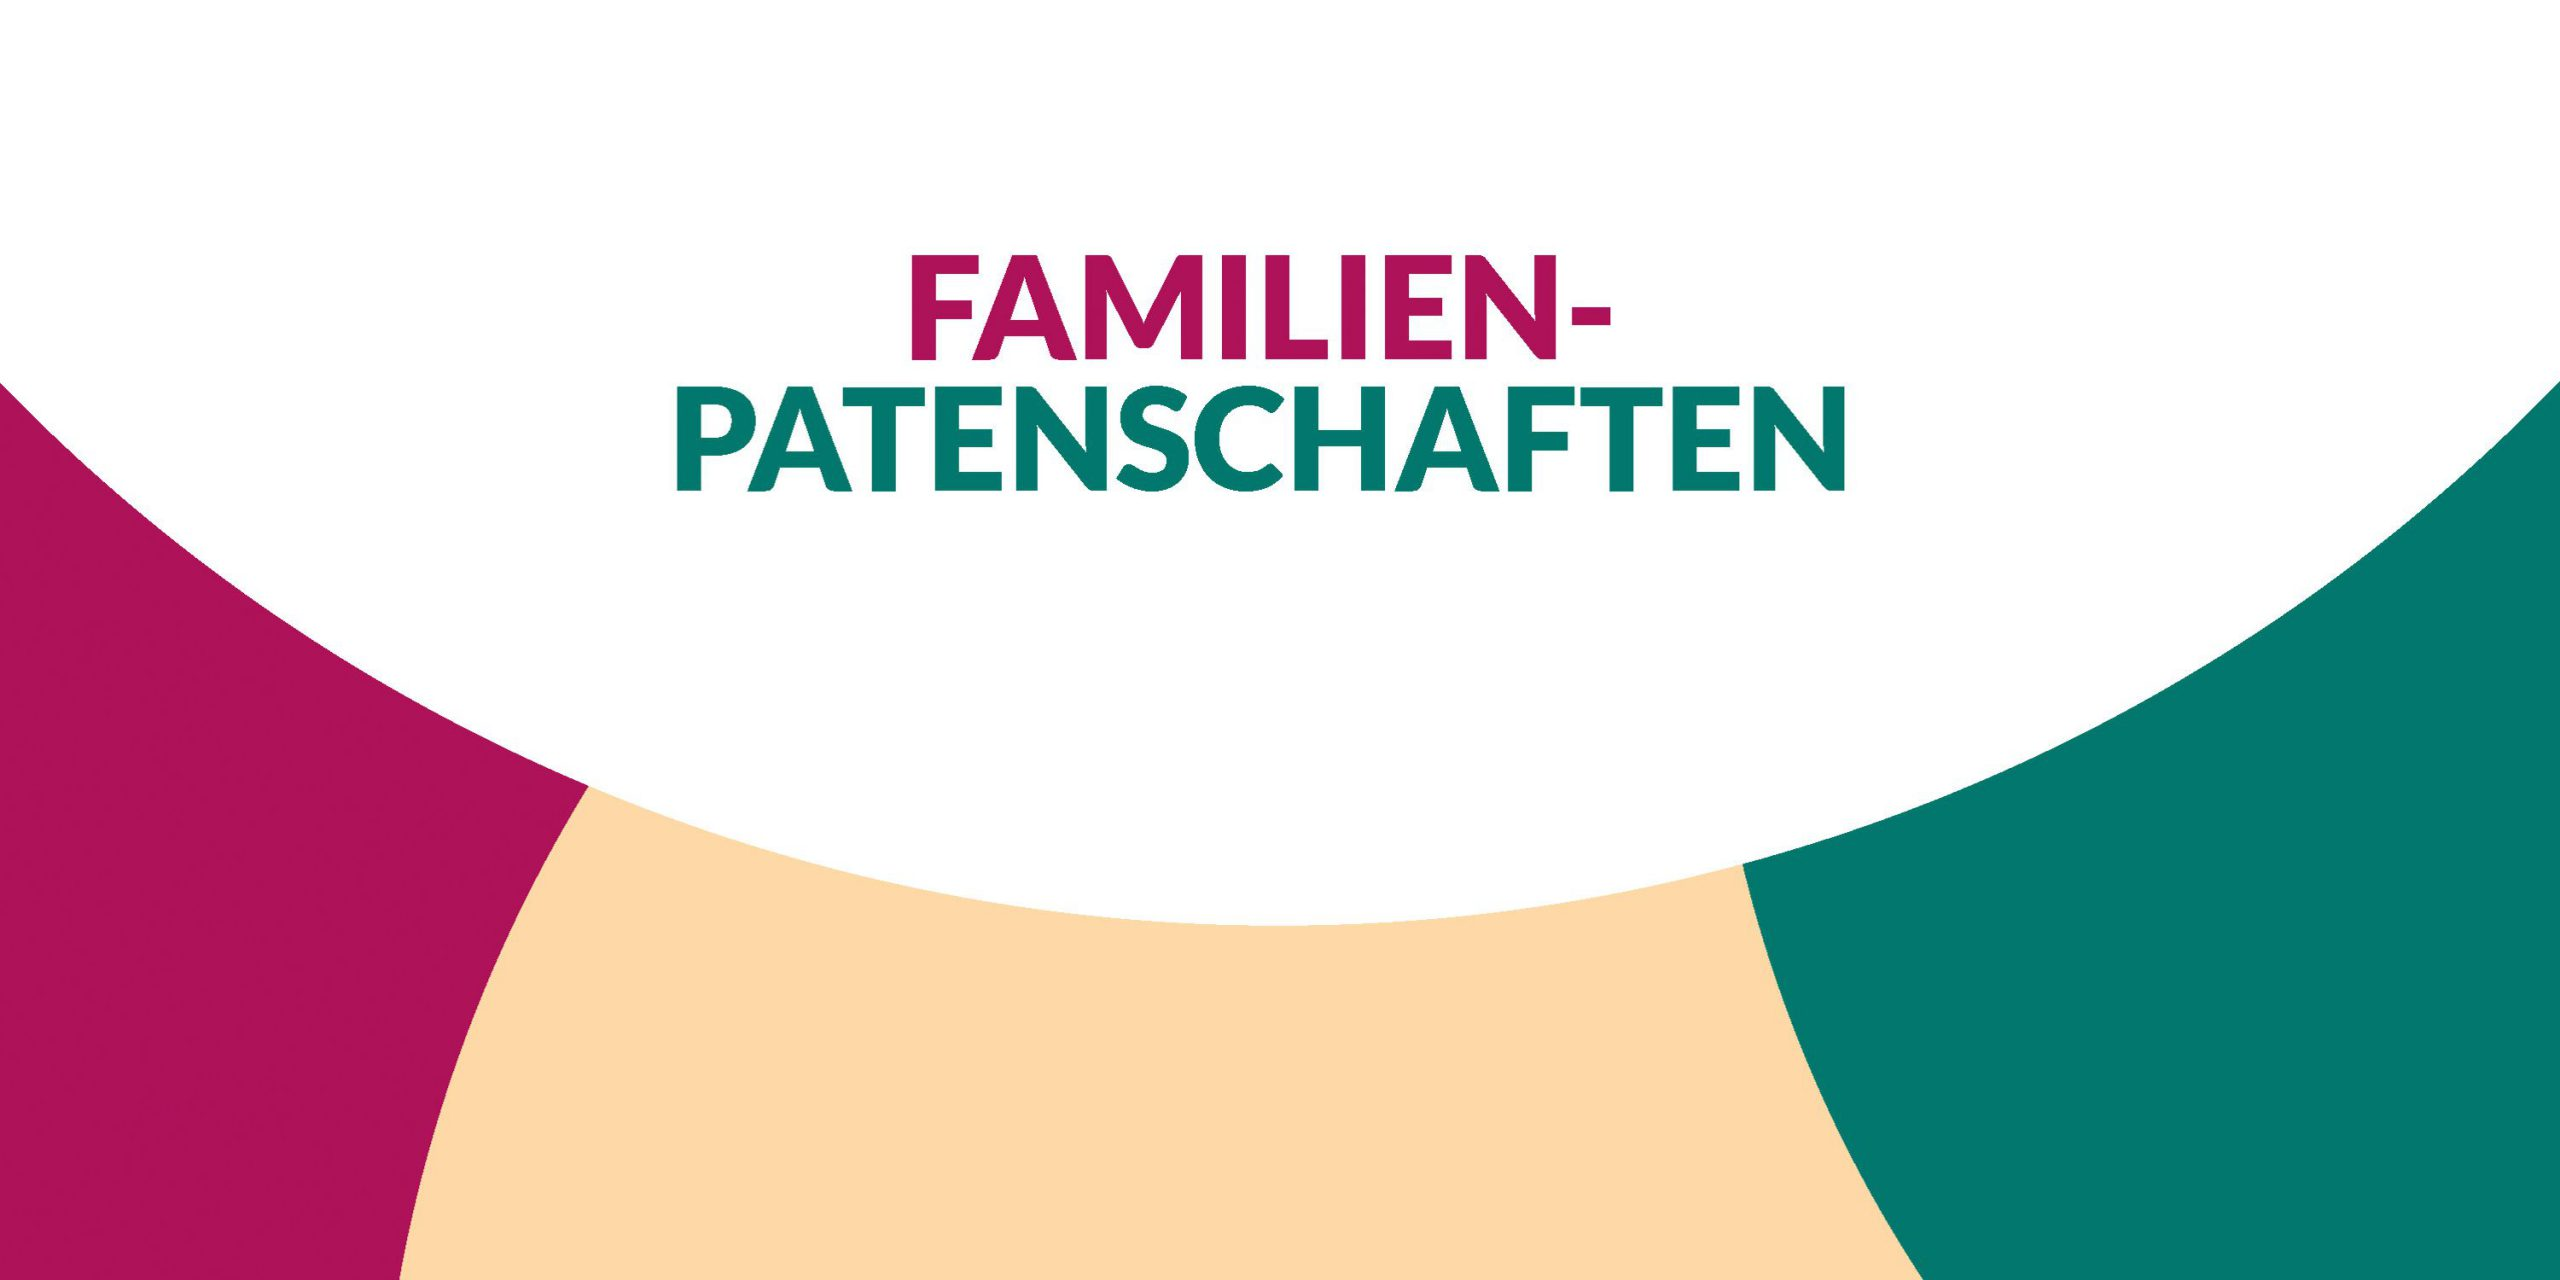 Kopf Familienpatenschaften Frauenzentrum Bautzen